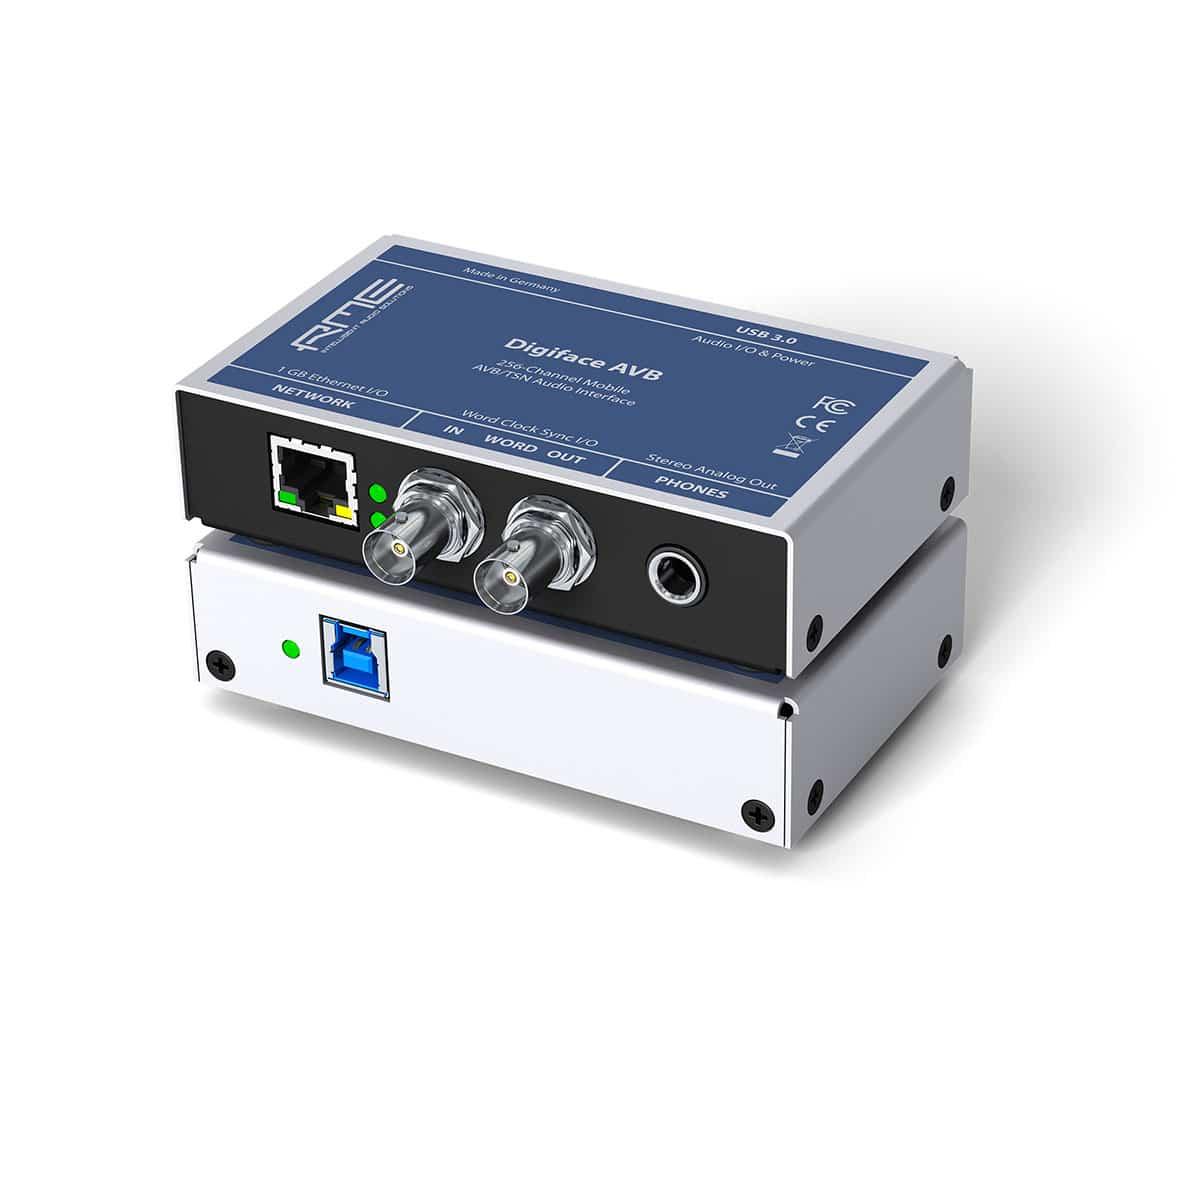 RME Digiface AVB 01 Convertitori Audio, Pro Audio, Audio Digitale, Schede Audio per PC e MAC